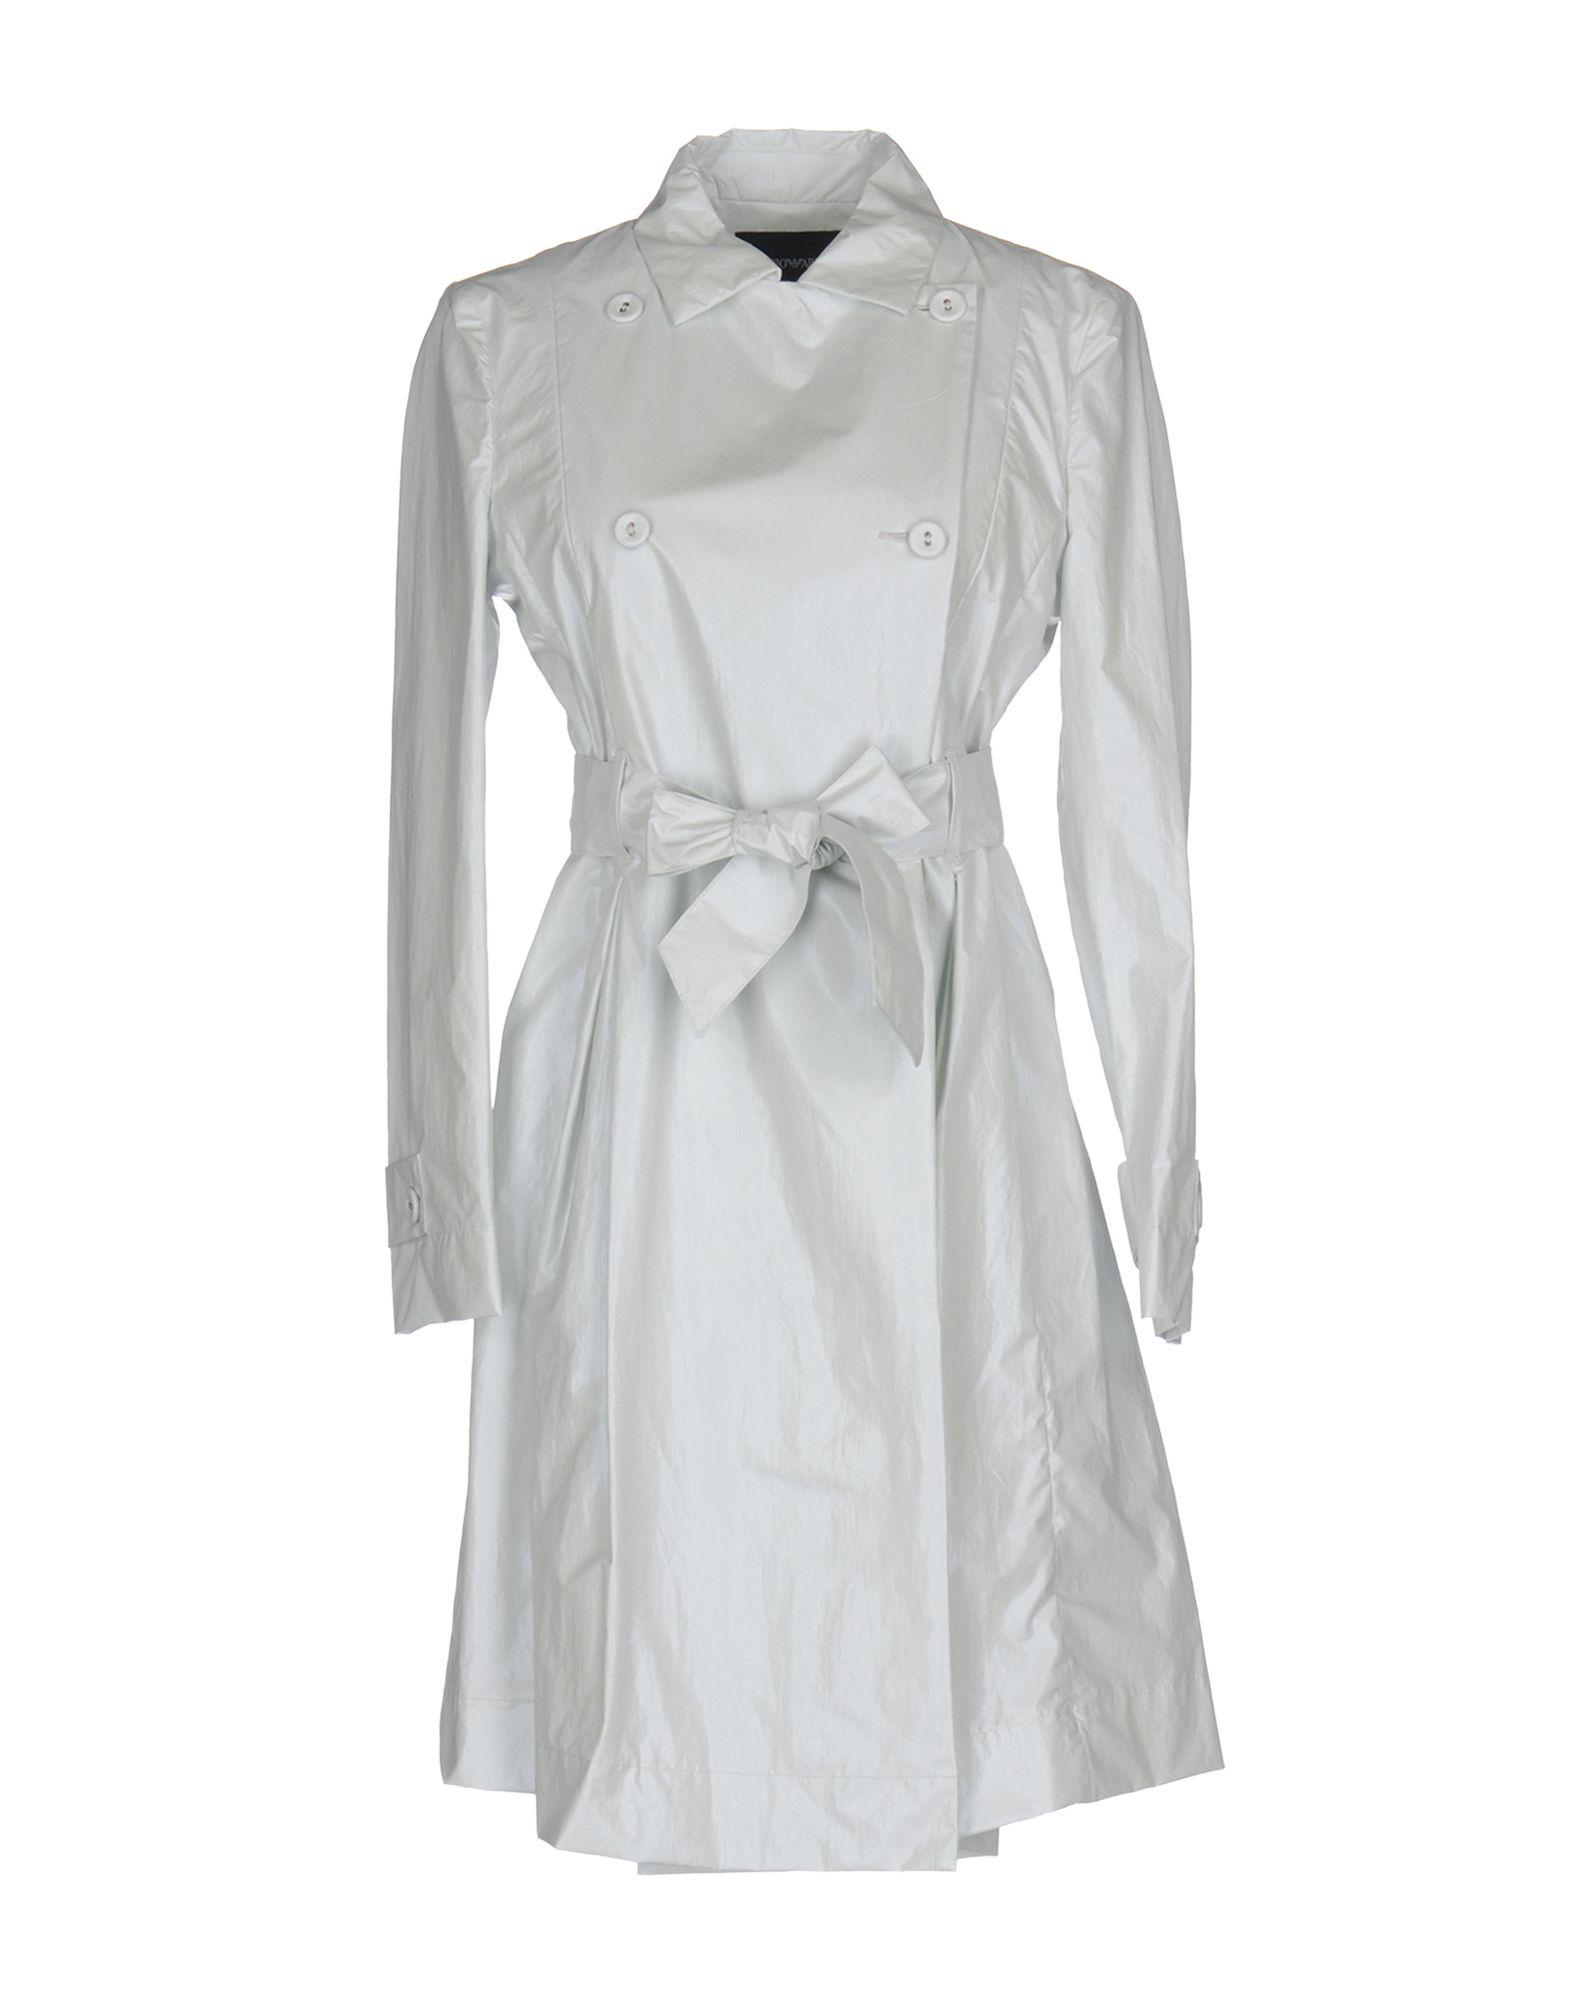 EMPORIO ARMANI Damen Lange Jacke Farbe Hellgrau Größe 2